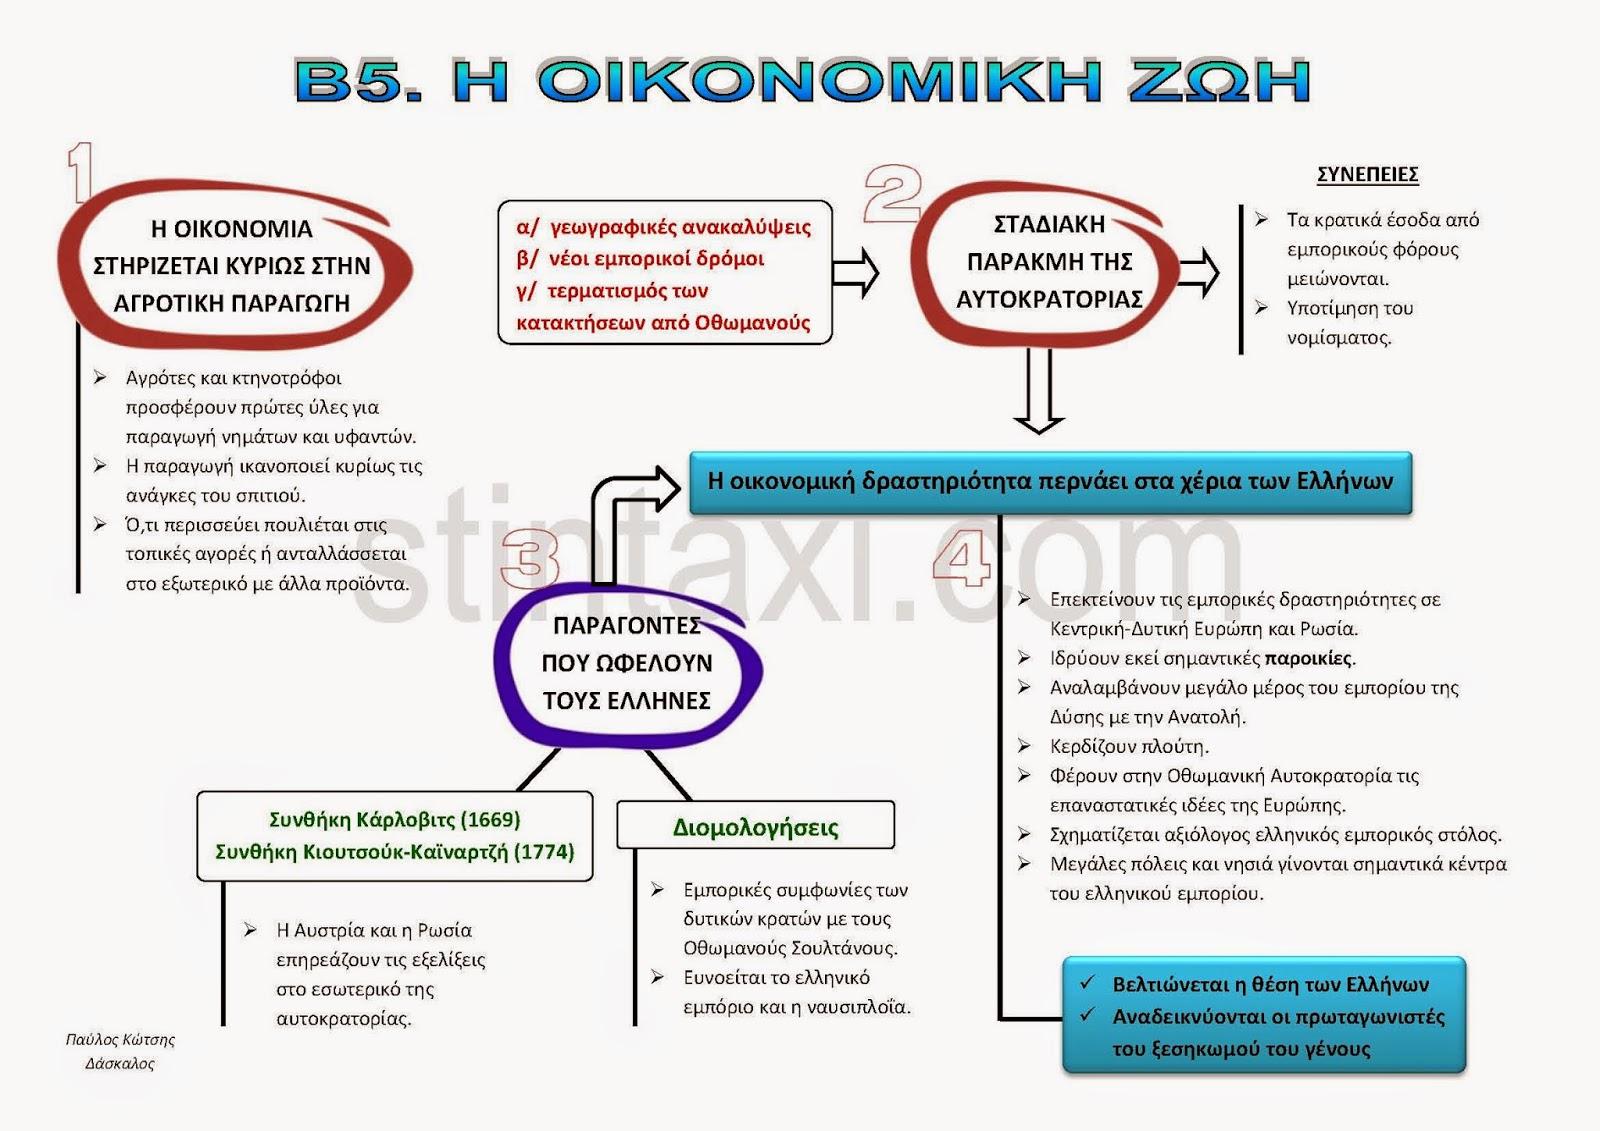 http://www.stintaxi.com/uploads/1/3/1/0/13100858/b5-oikonom-zoi-v2.1.pdf